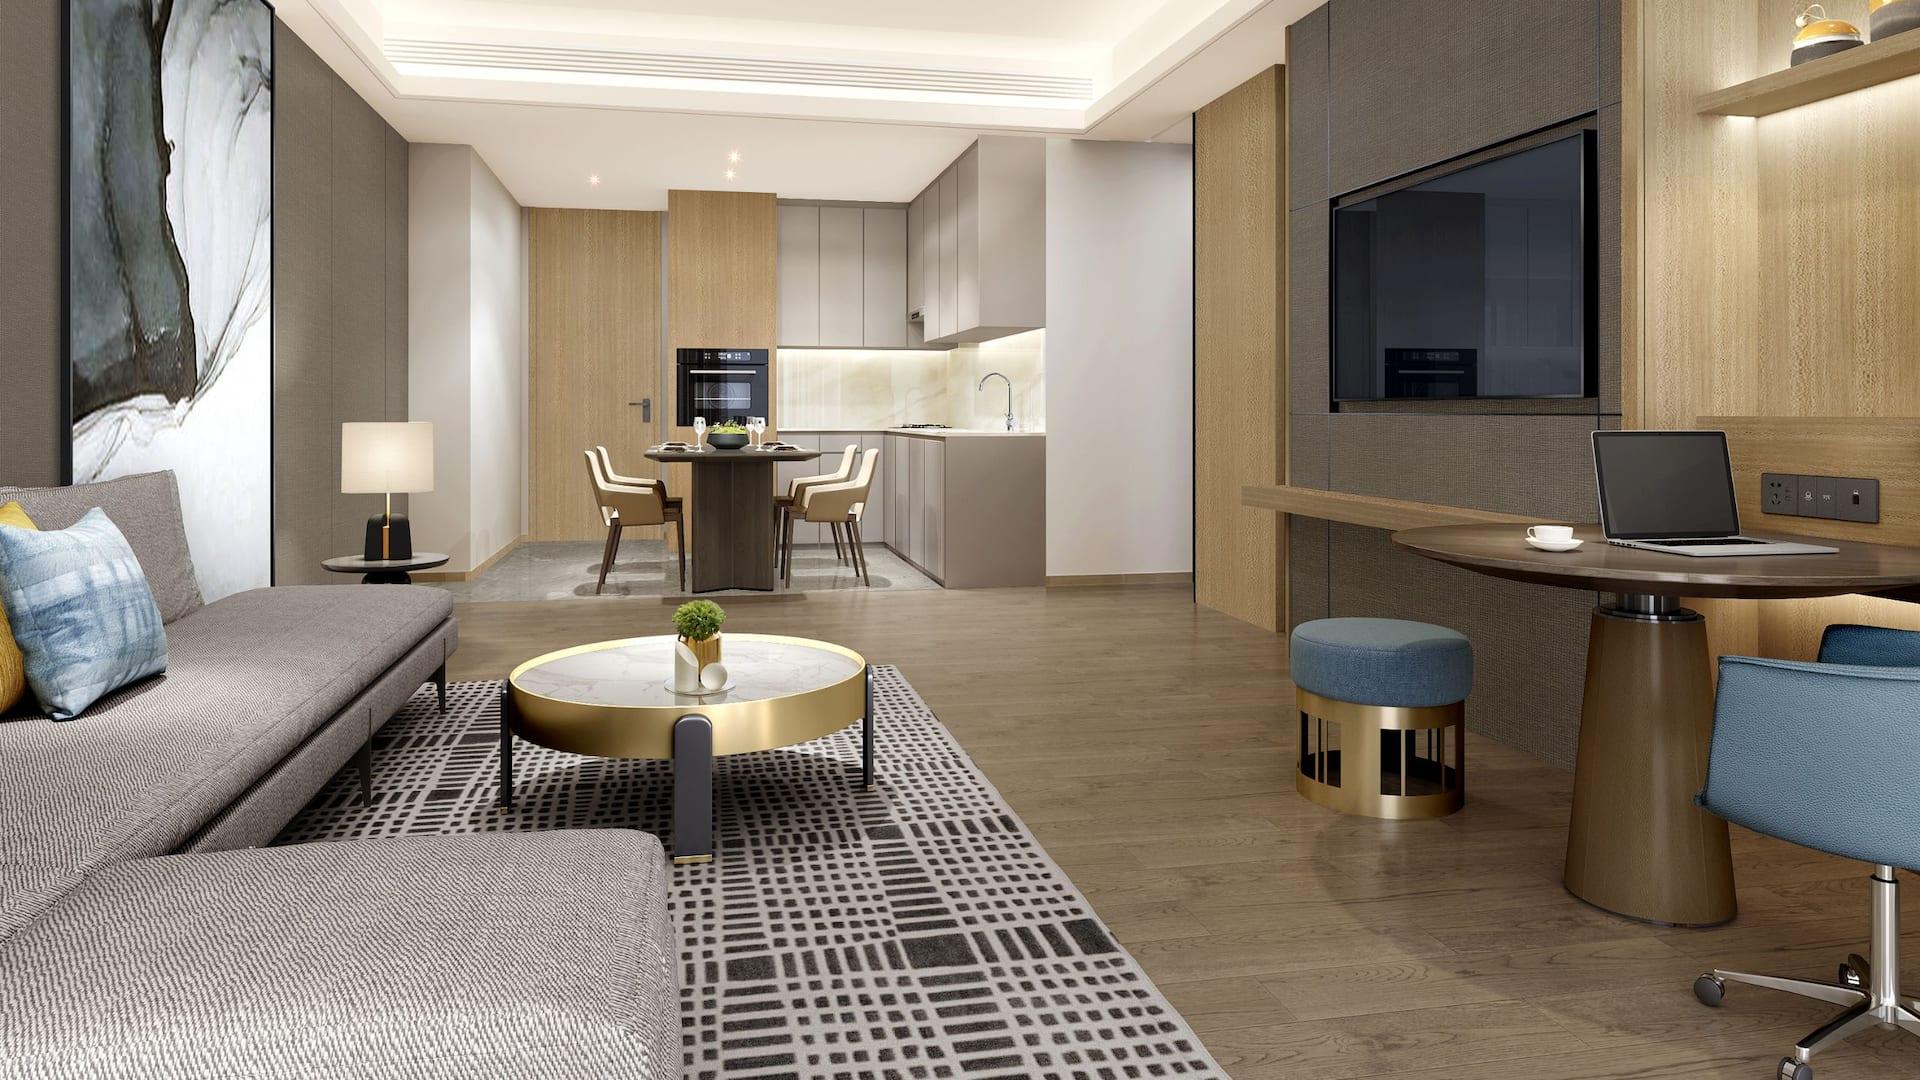 King Suite with Kitchen Bedroom